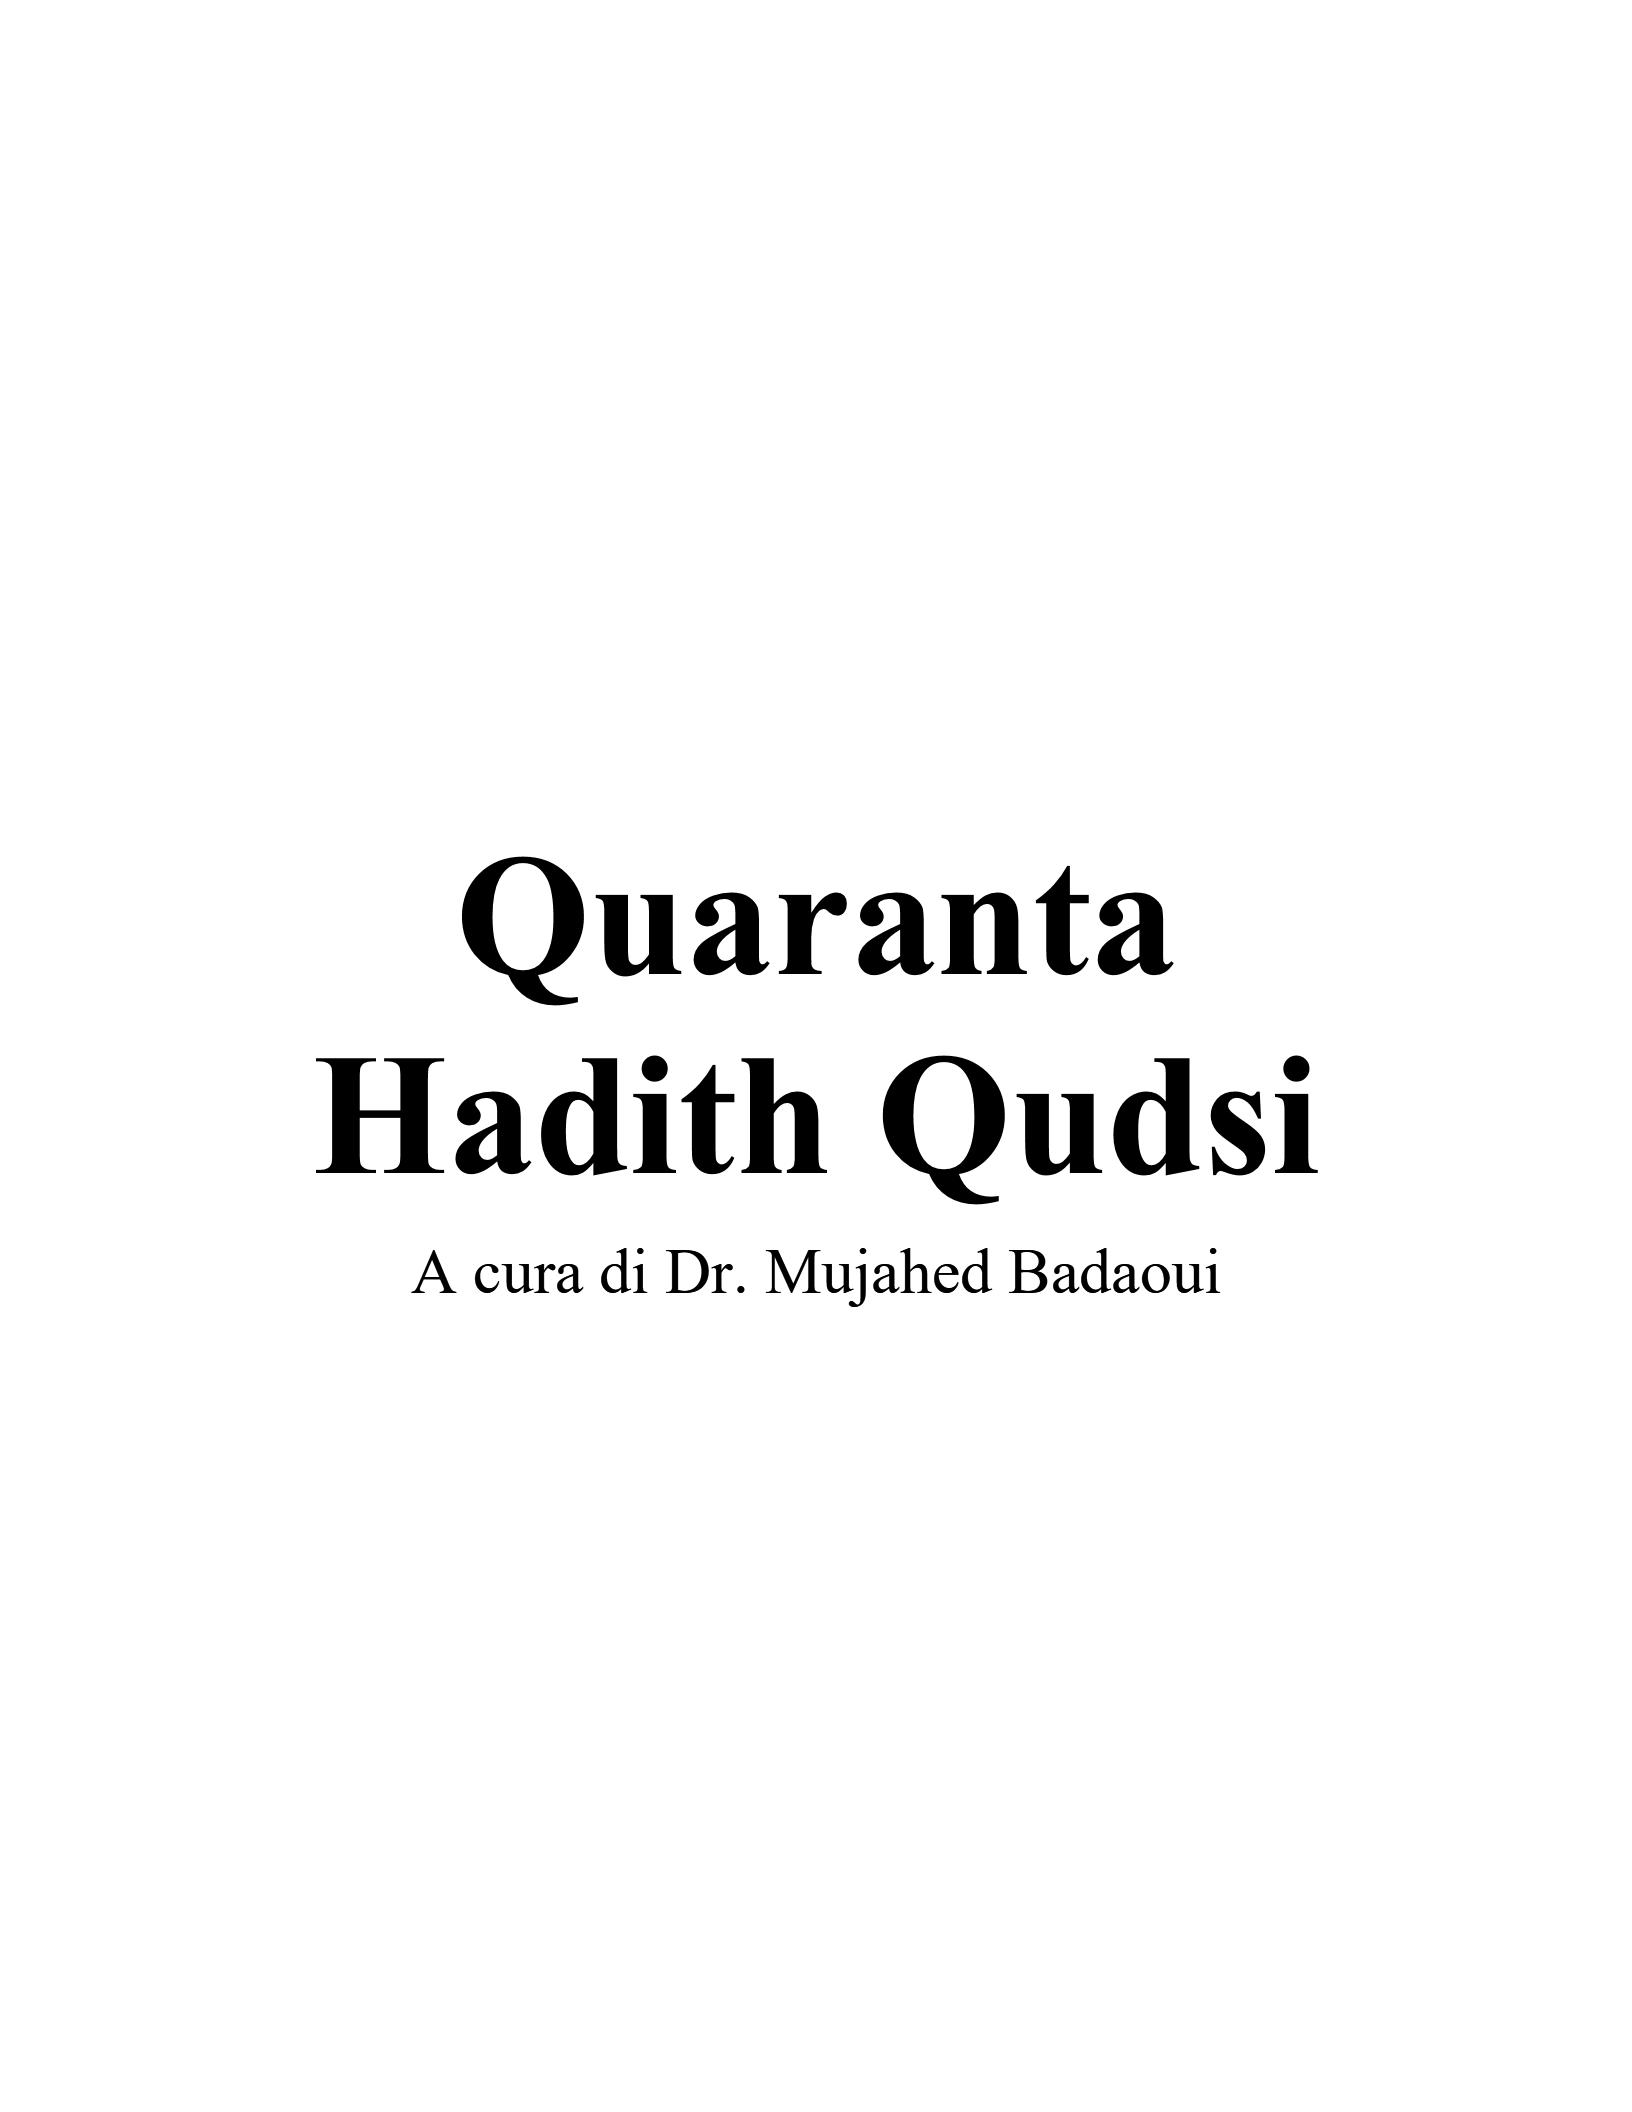 Quaranta Hadith Qudsi A cura di Dr. Mujahed Badaoui